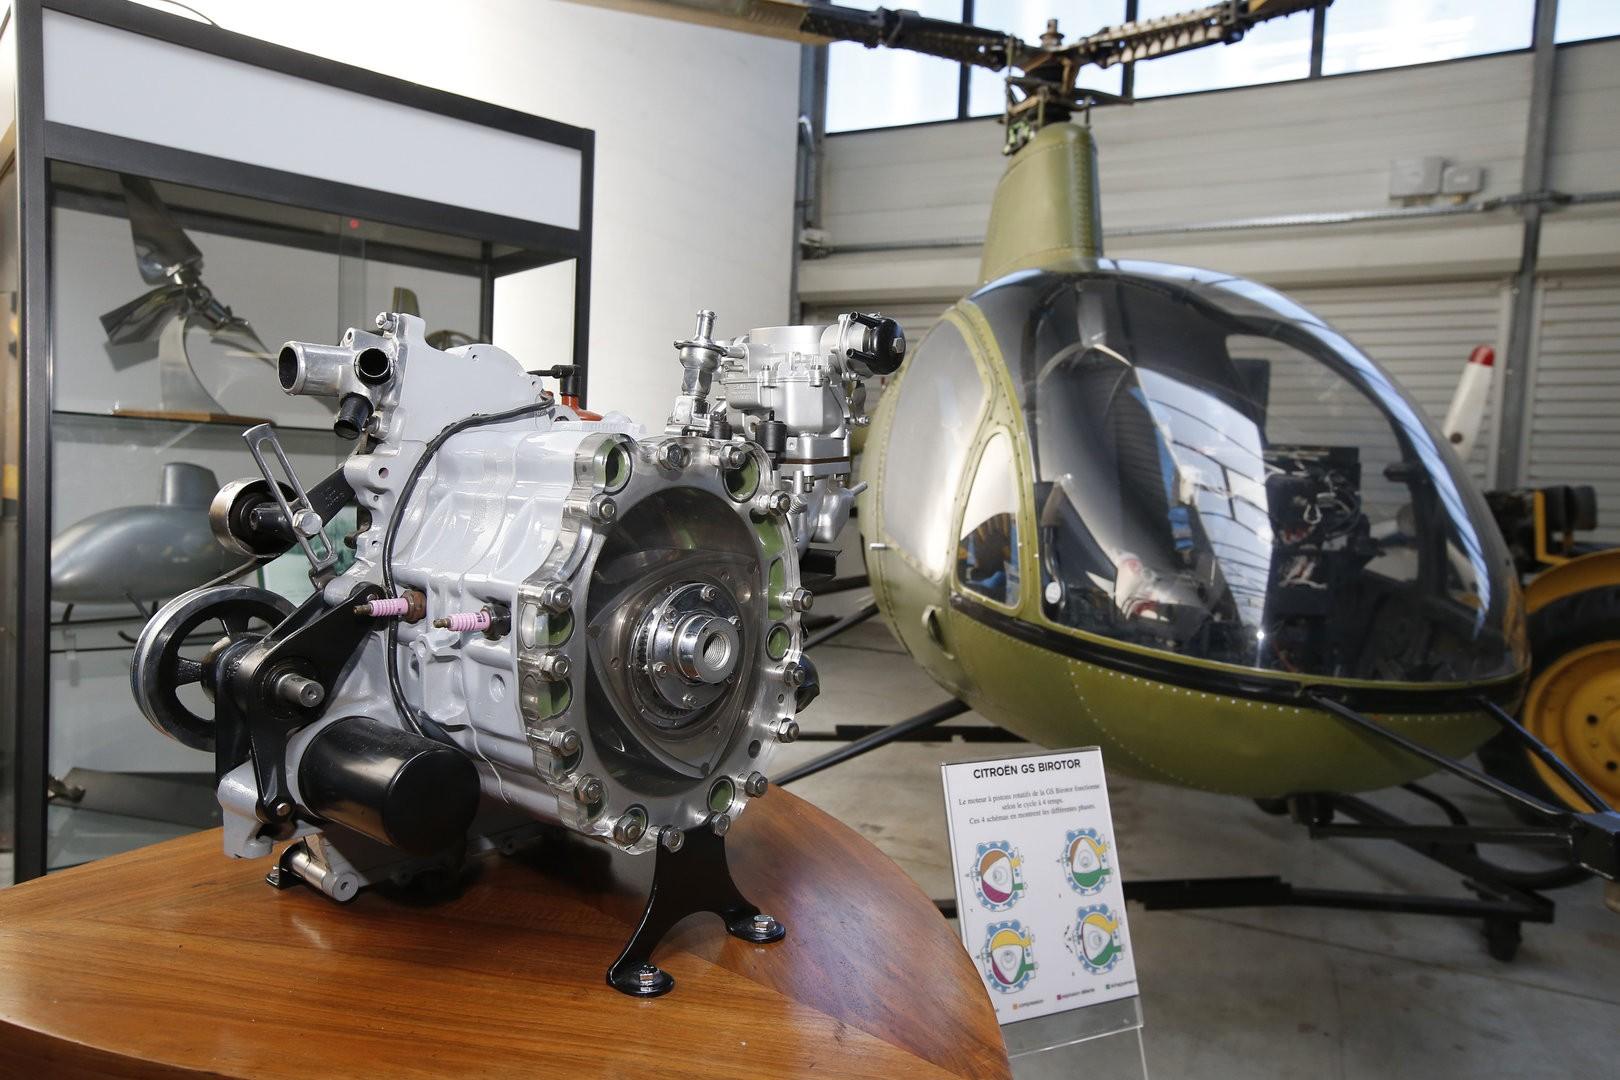 Birrotor helicoptero